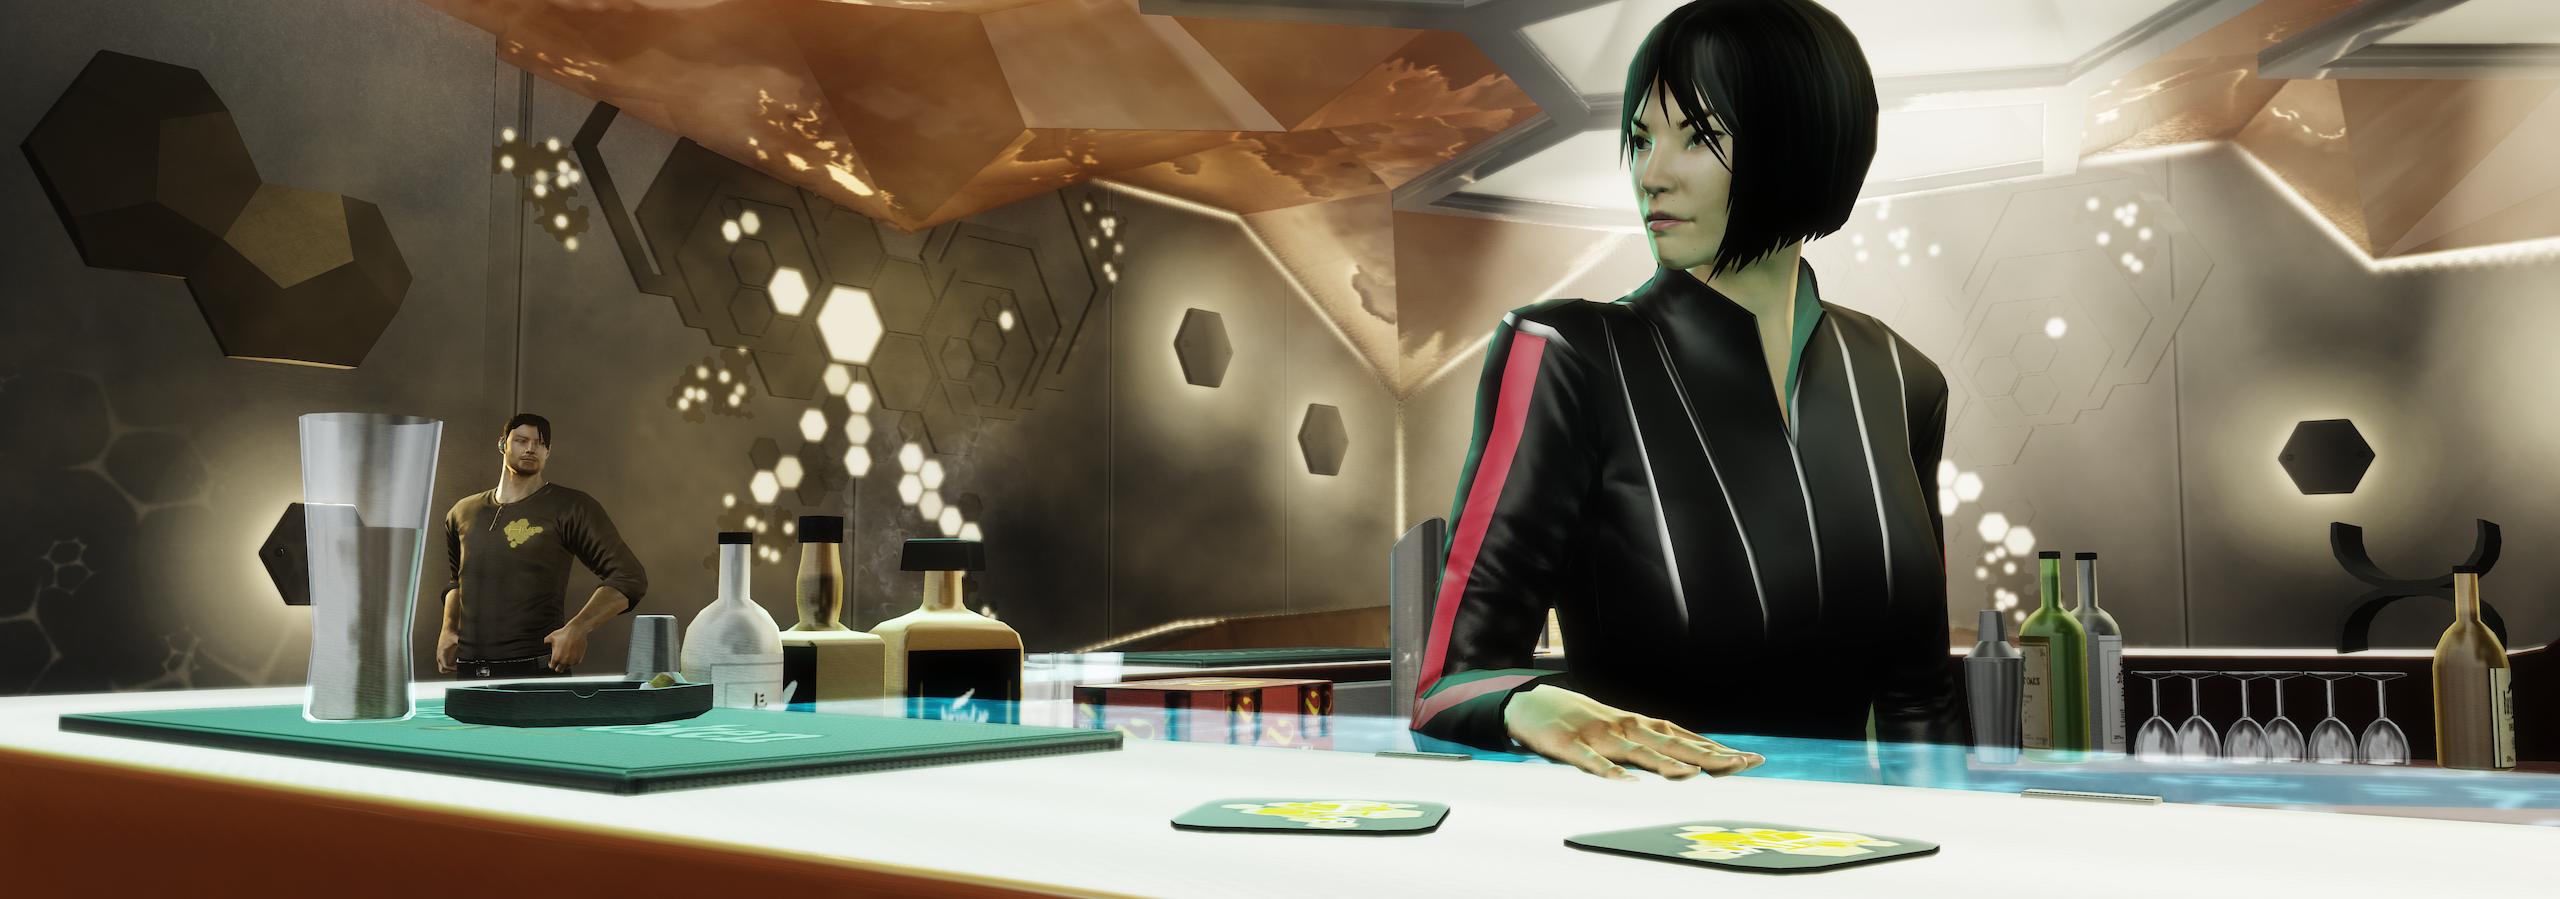 glasshouse.png - Deus Ex: Human Revolution